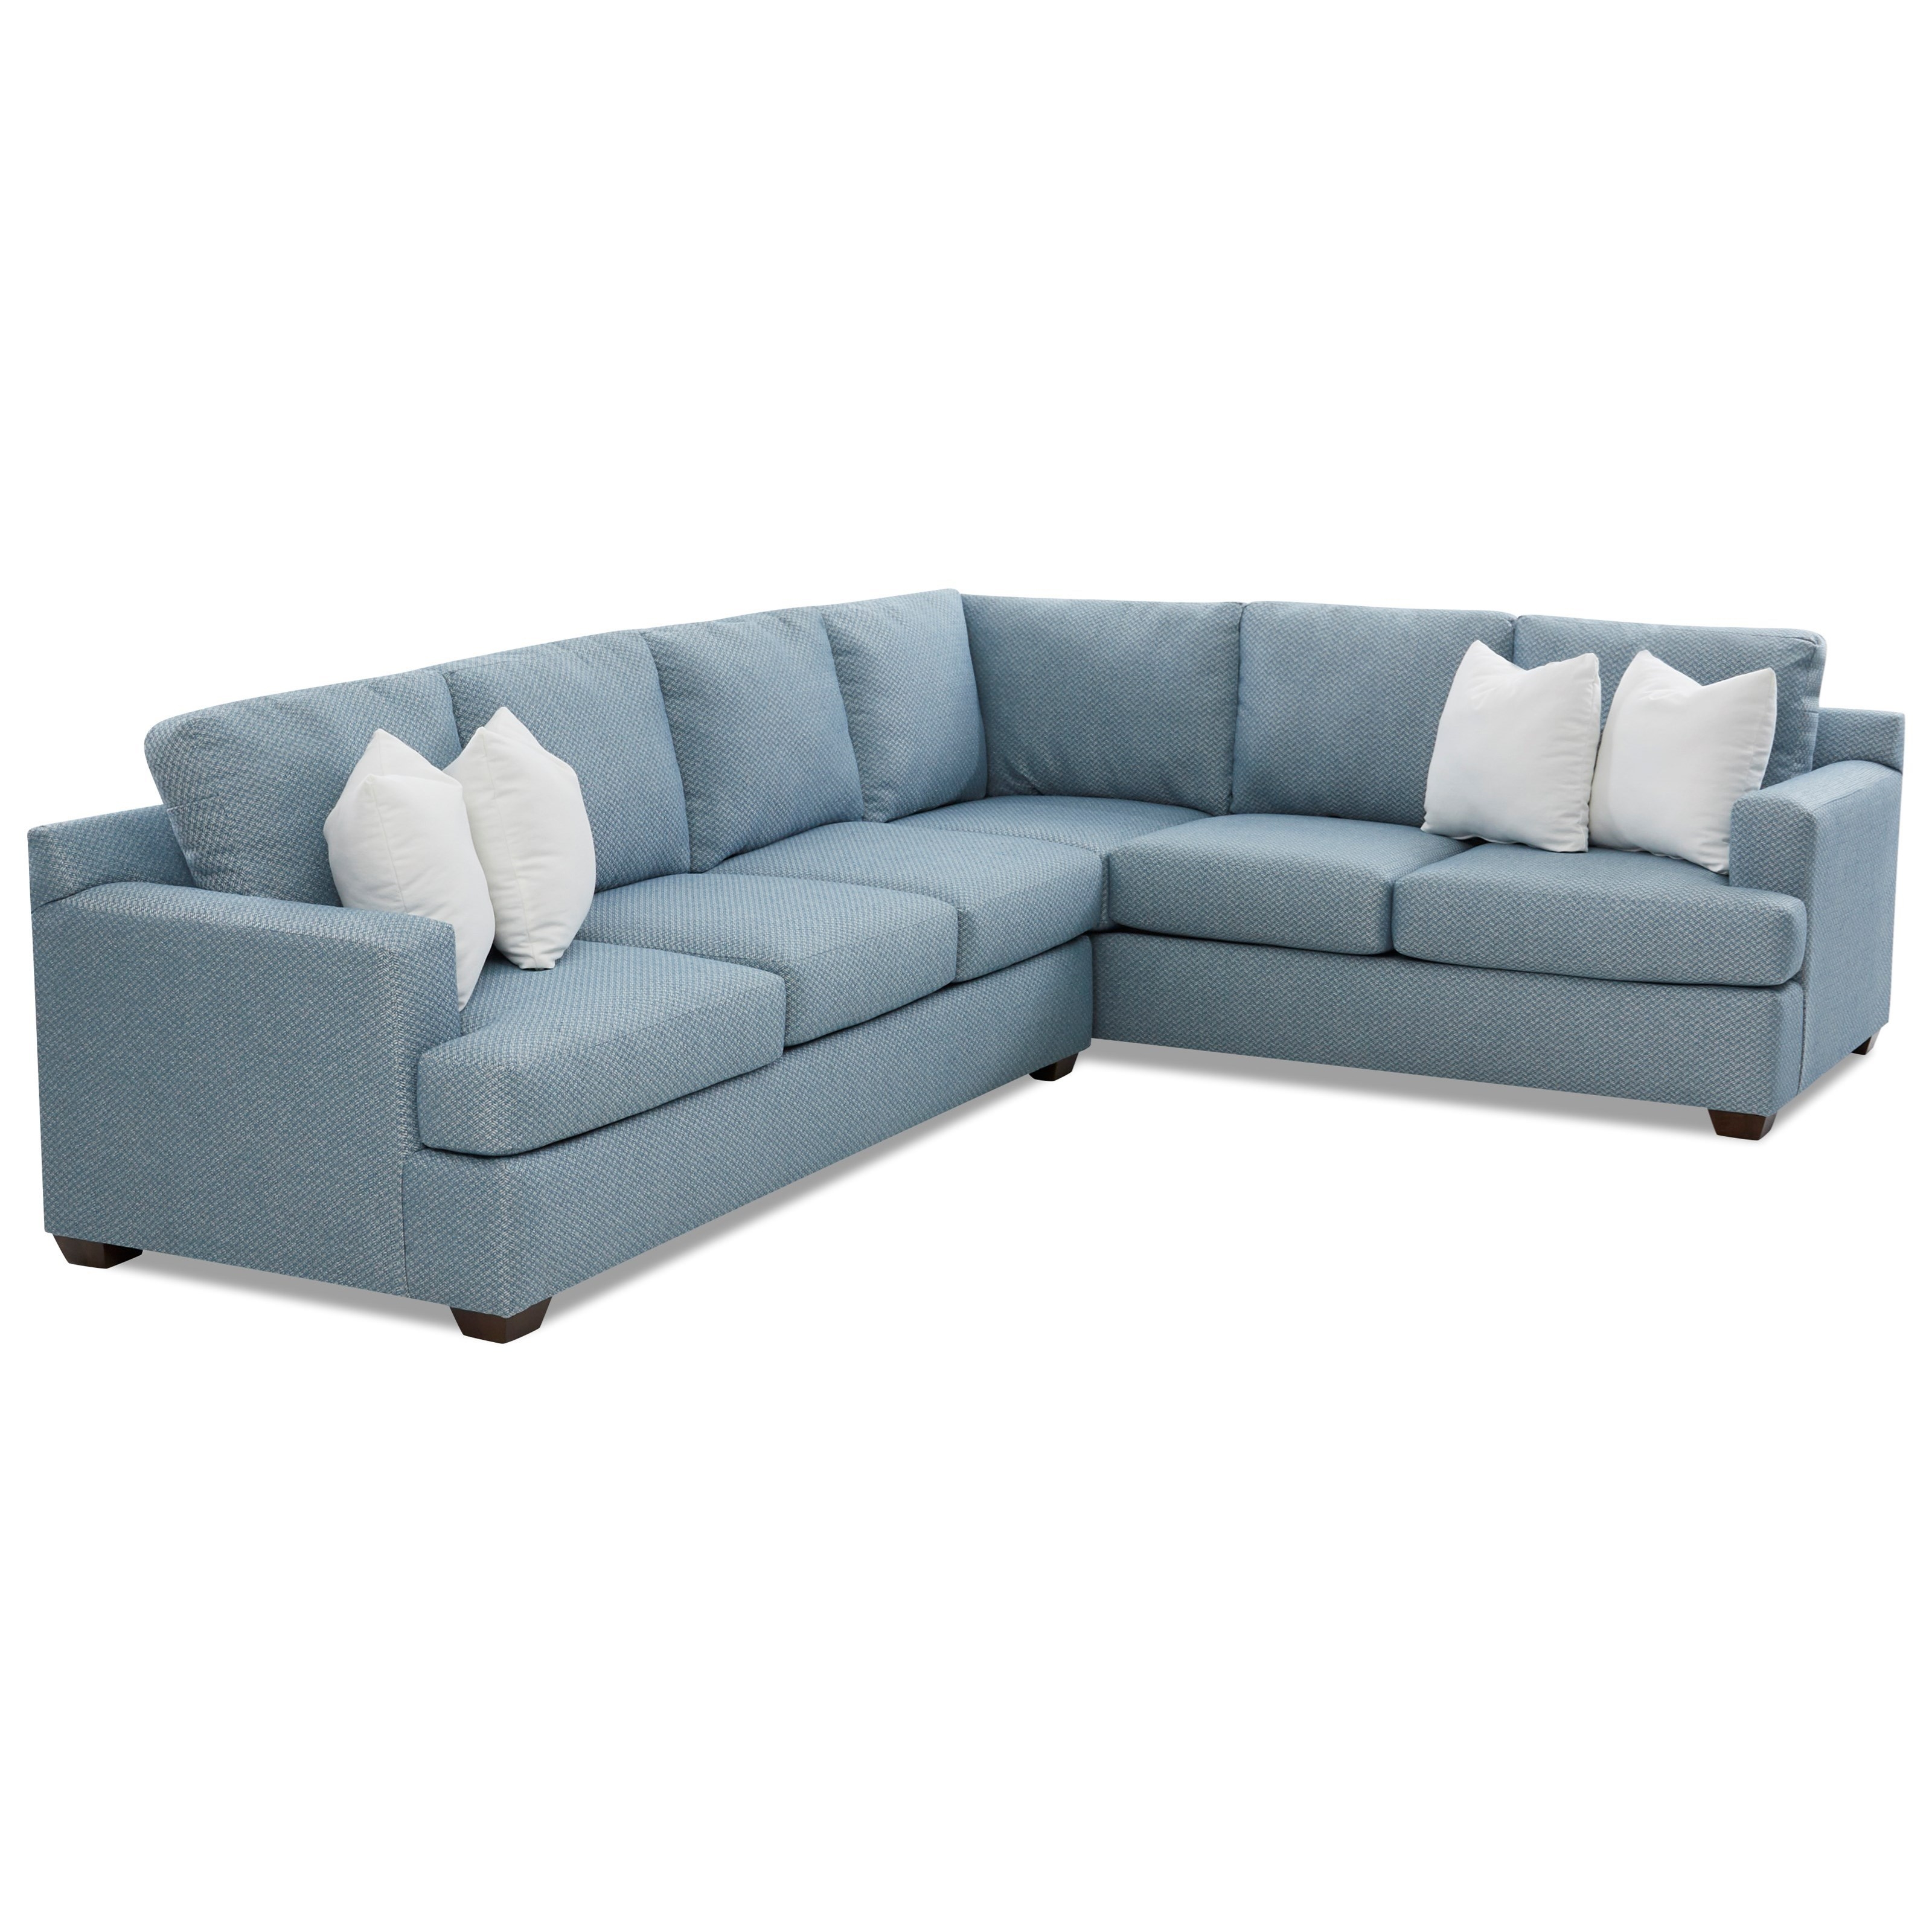 Klaussner Juniper 5-Seat Sectional Sofa with RAF Corner Sofa | EFO ...